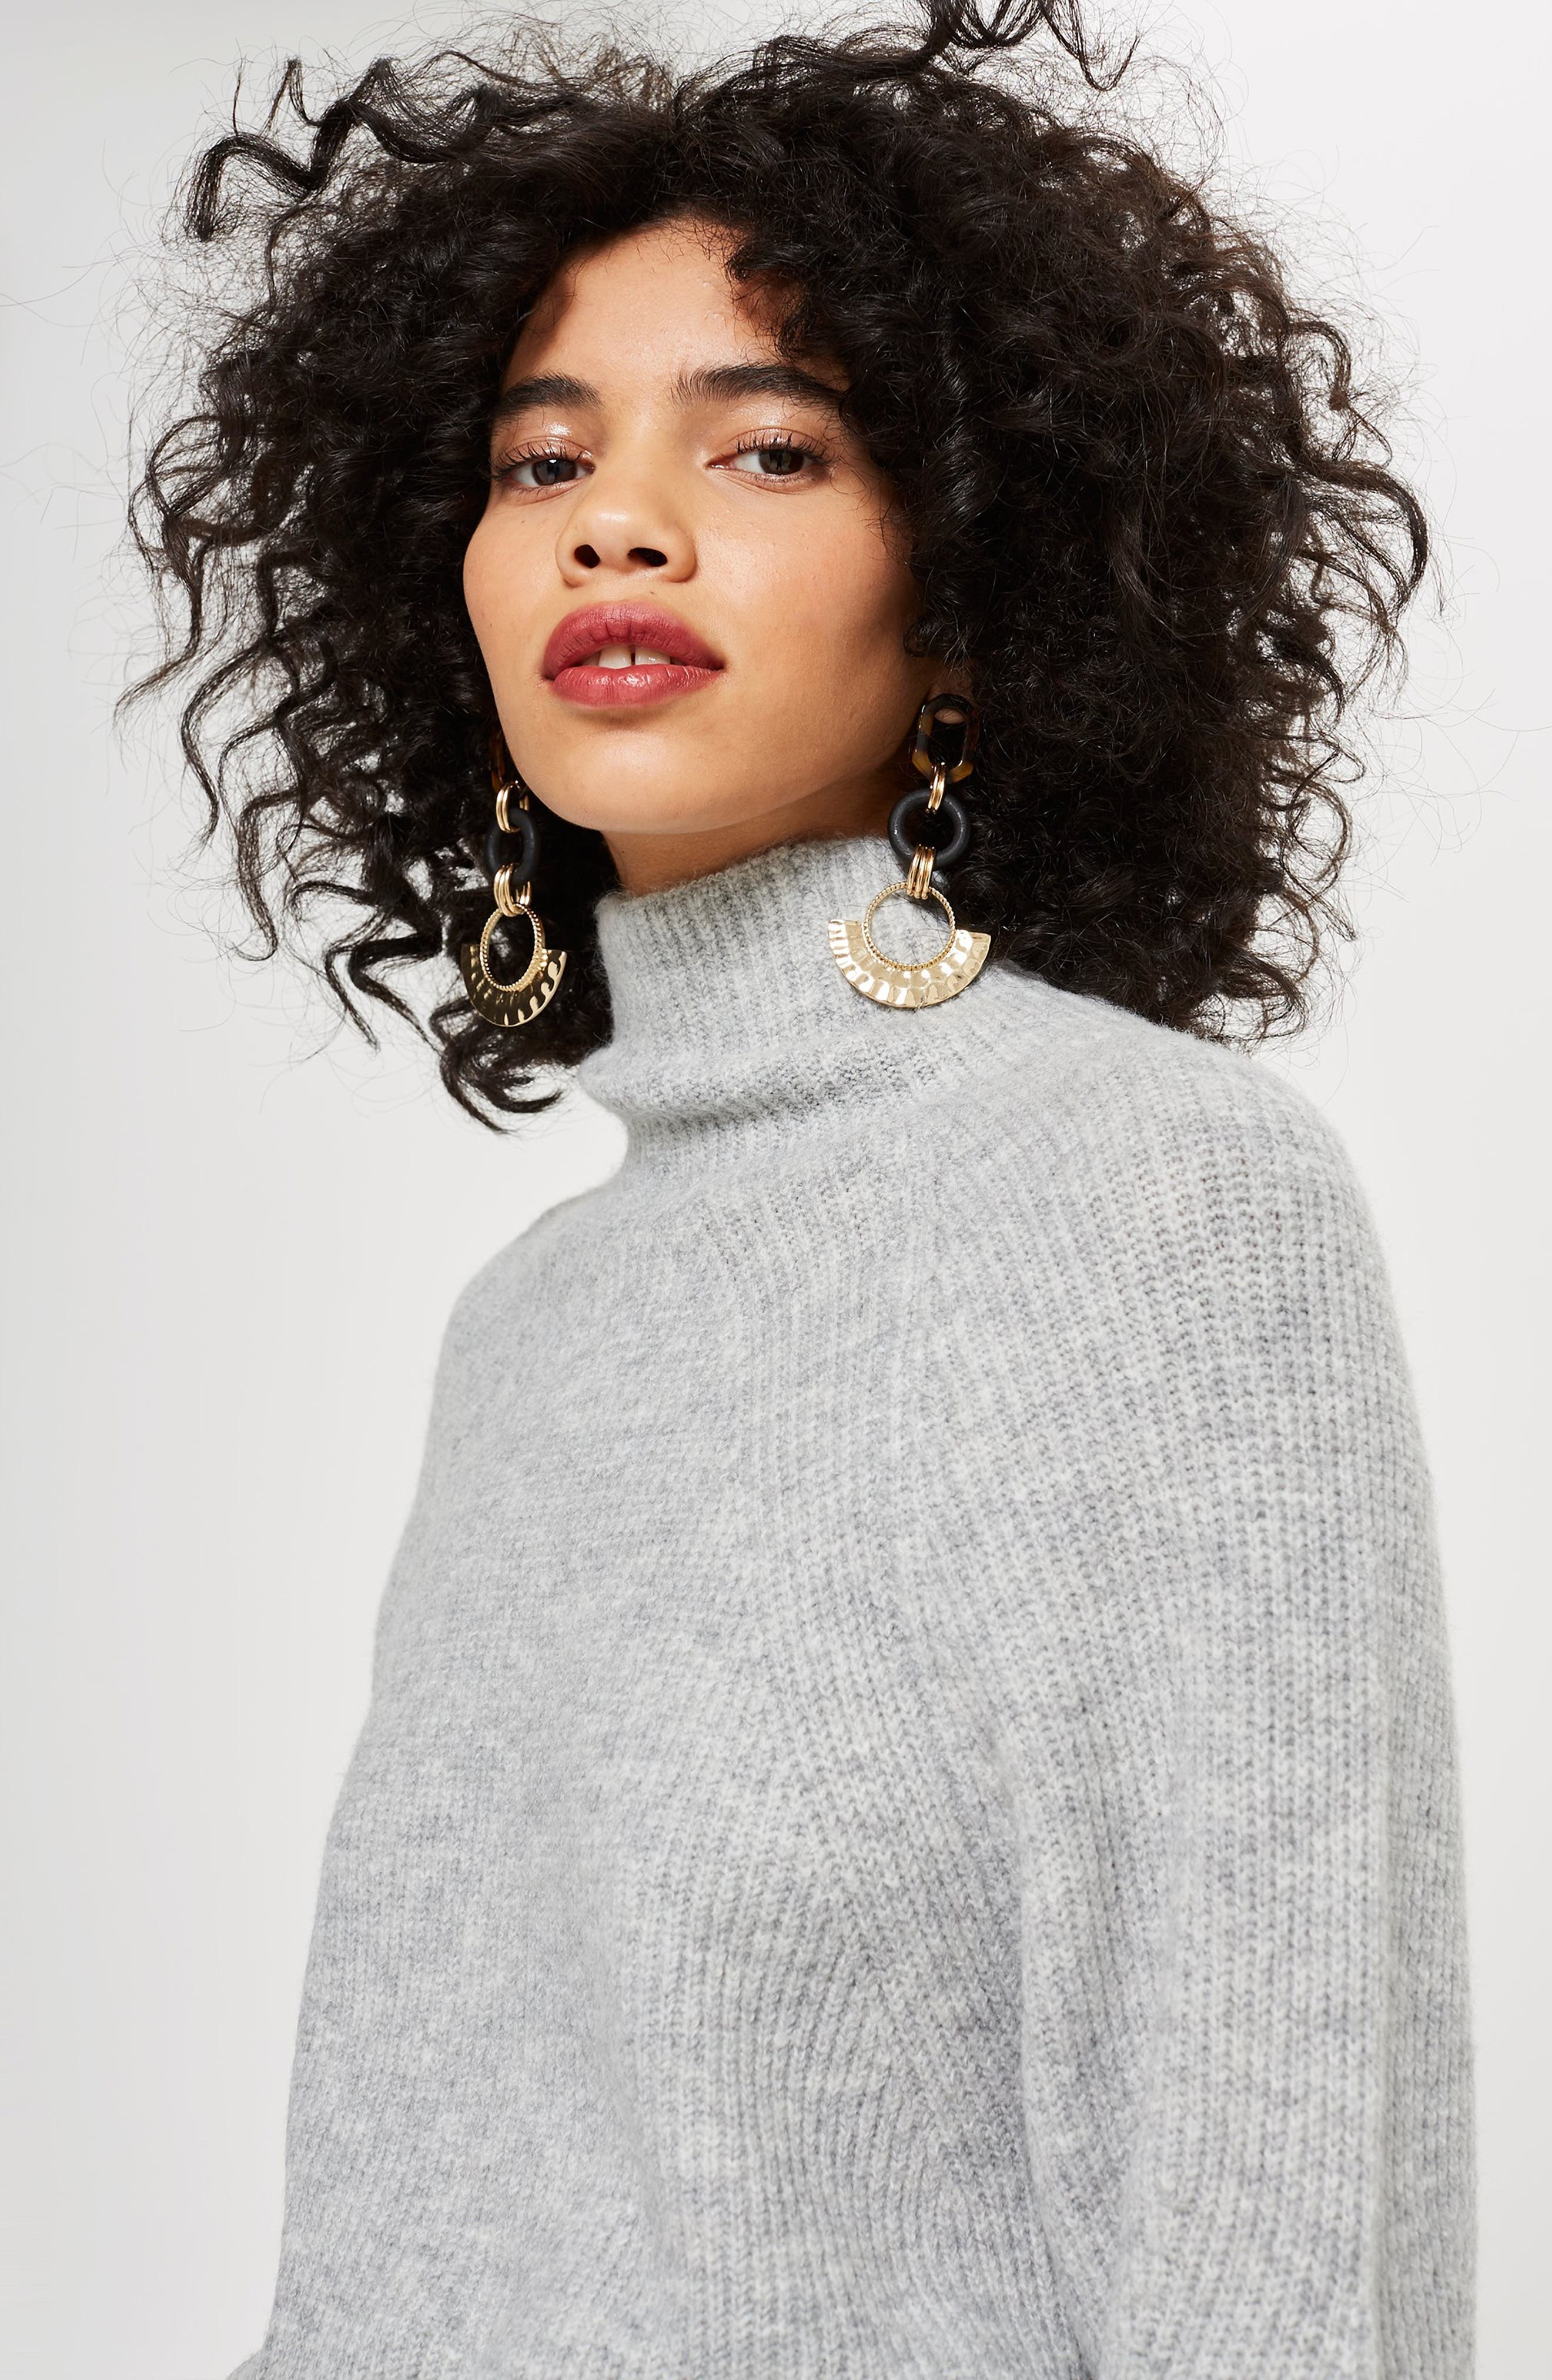 Raglan Turtleneck Neck Sweater,                             Alternate thumbnail 4, color,                             GREY MARL